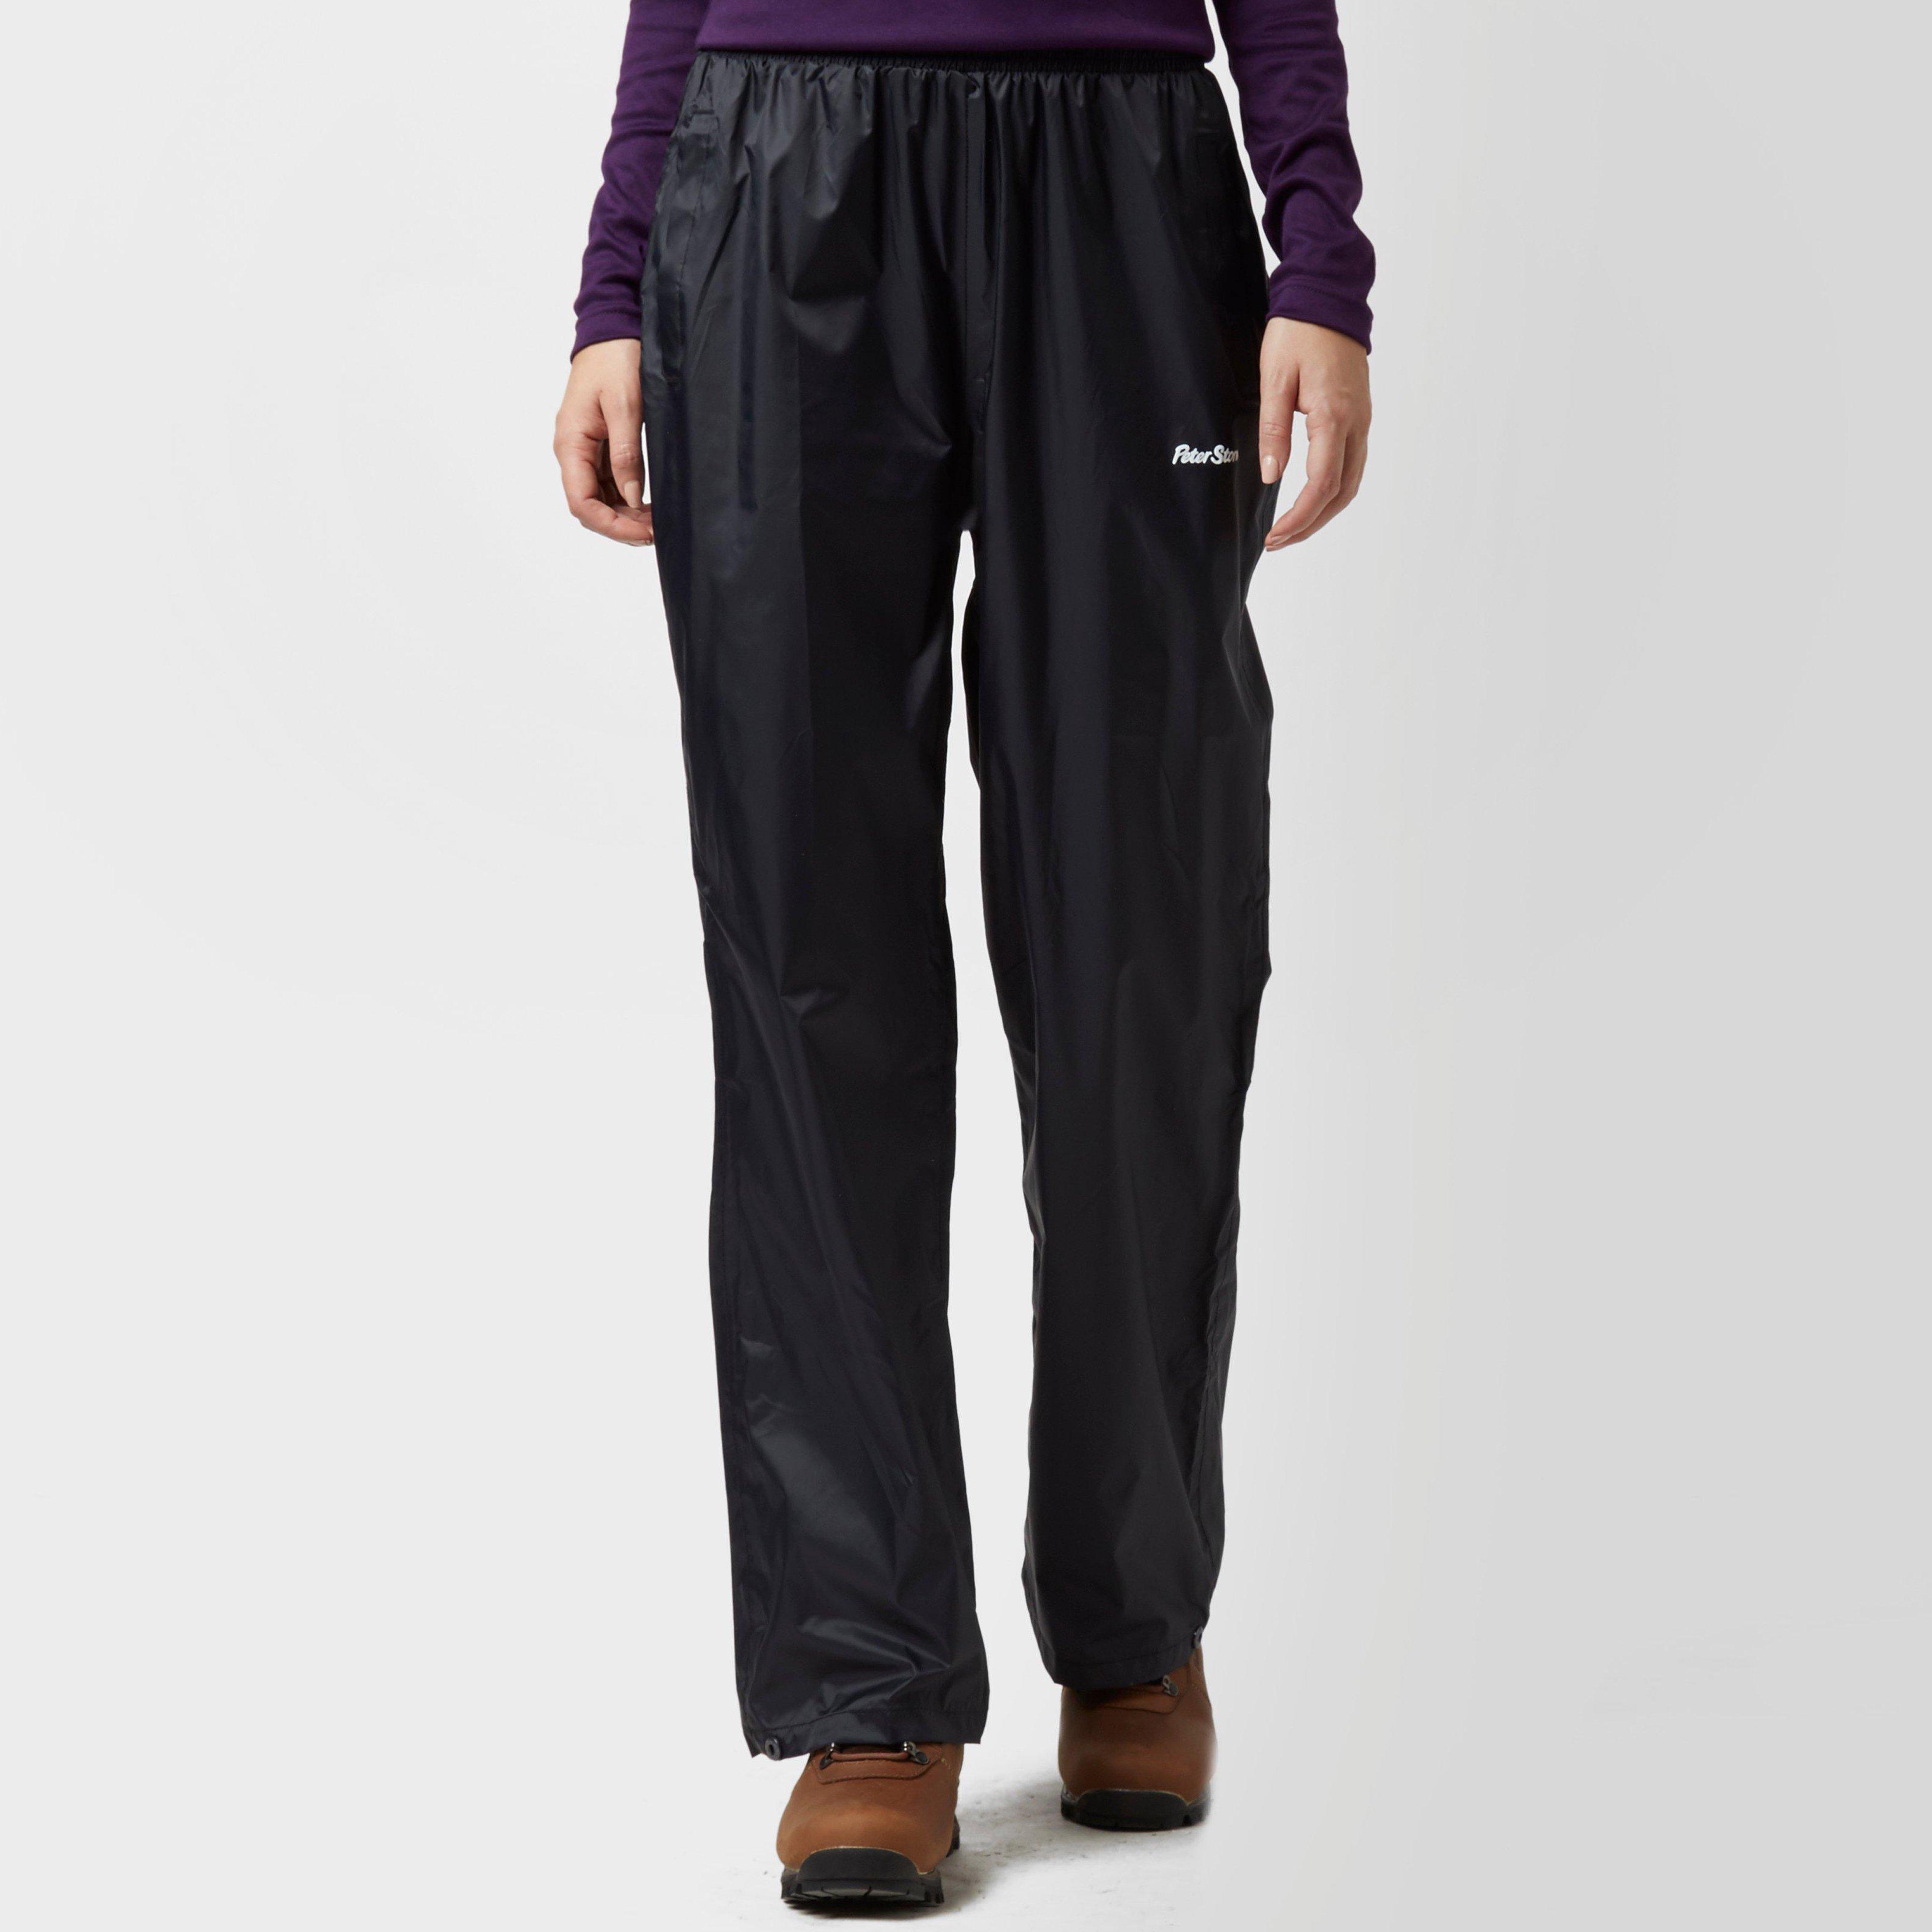 Peter Storm Peter Storm womens Packable Pants - Black, Black